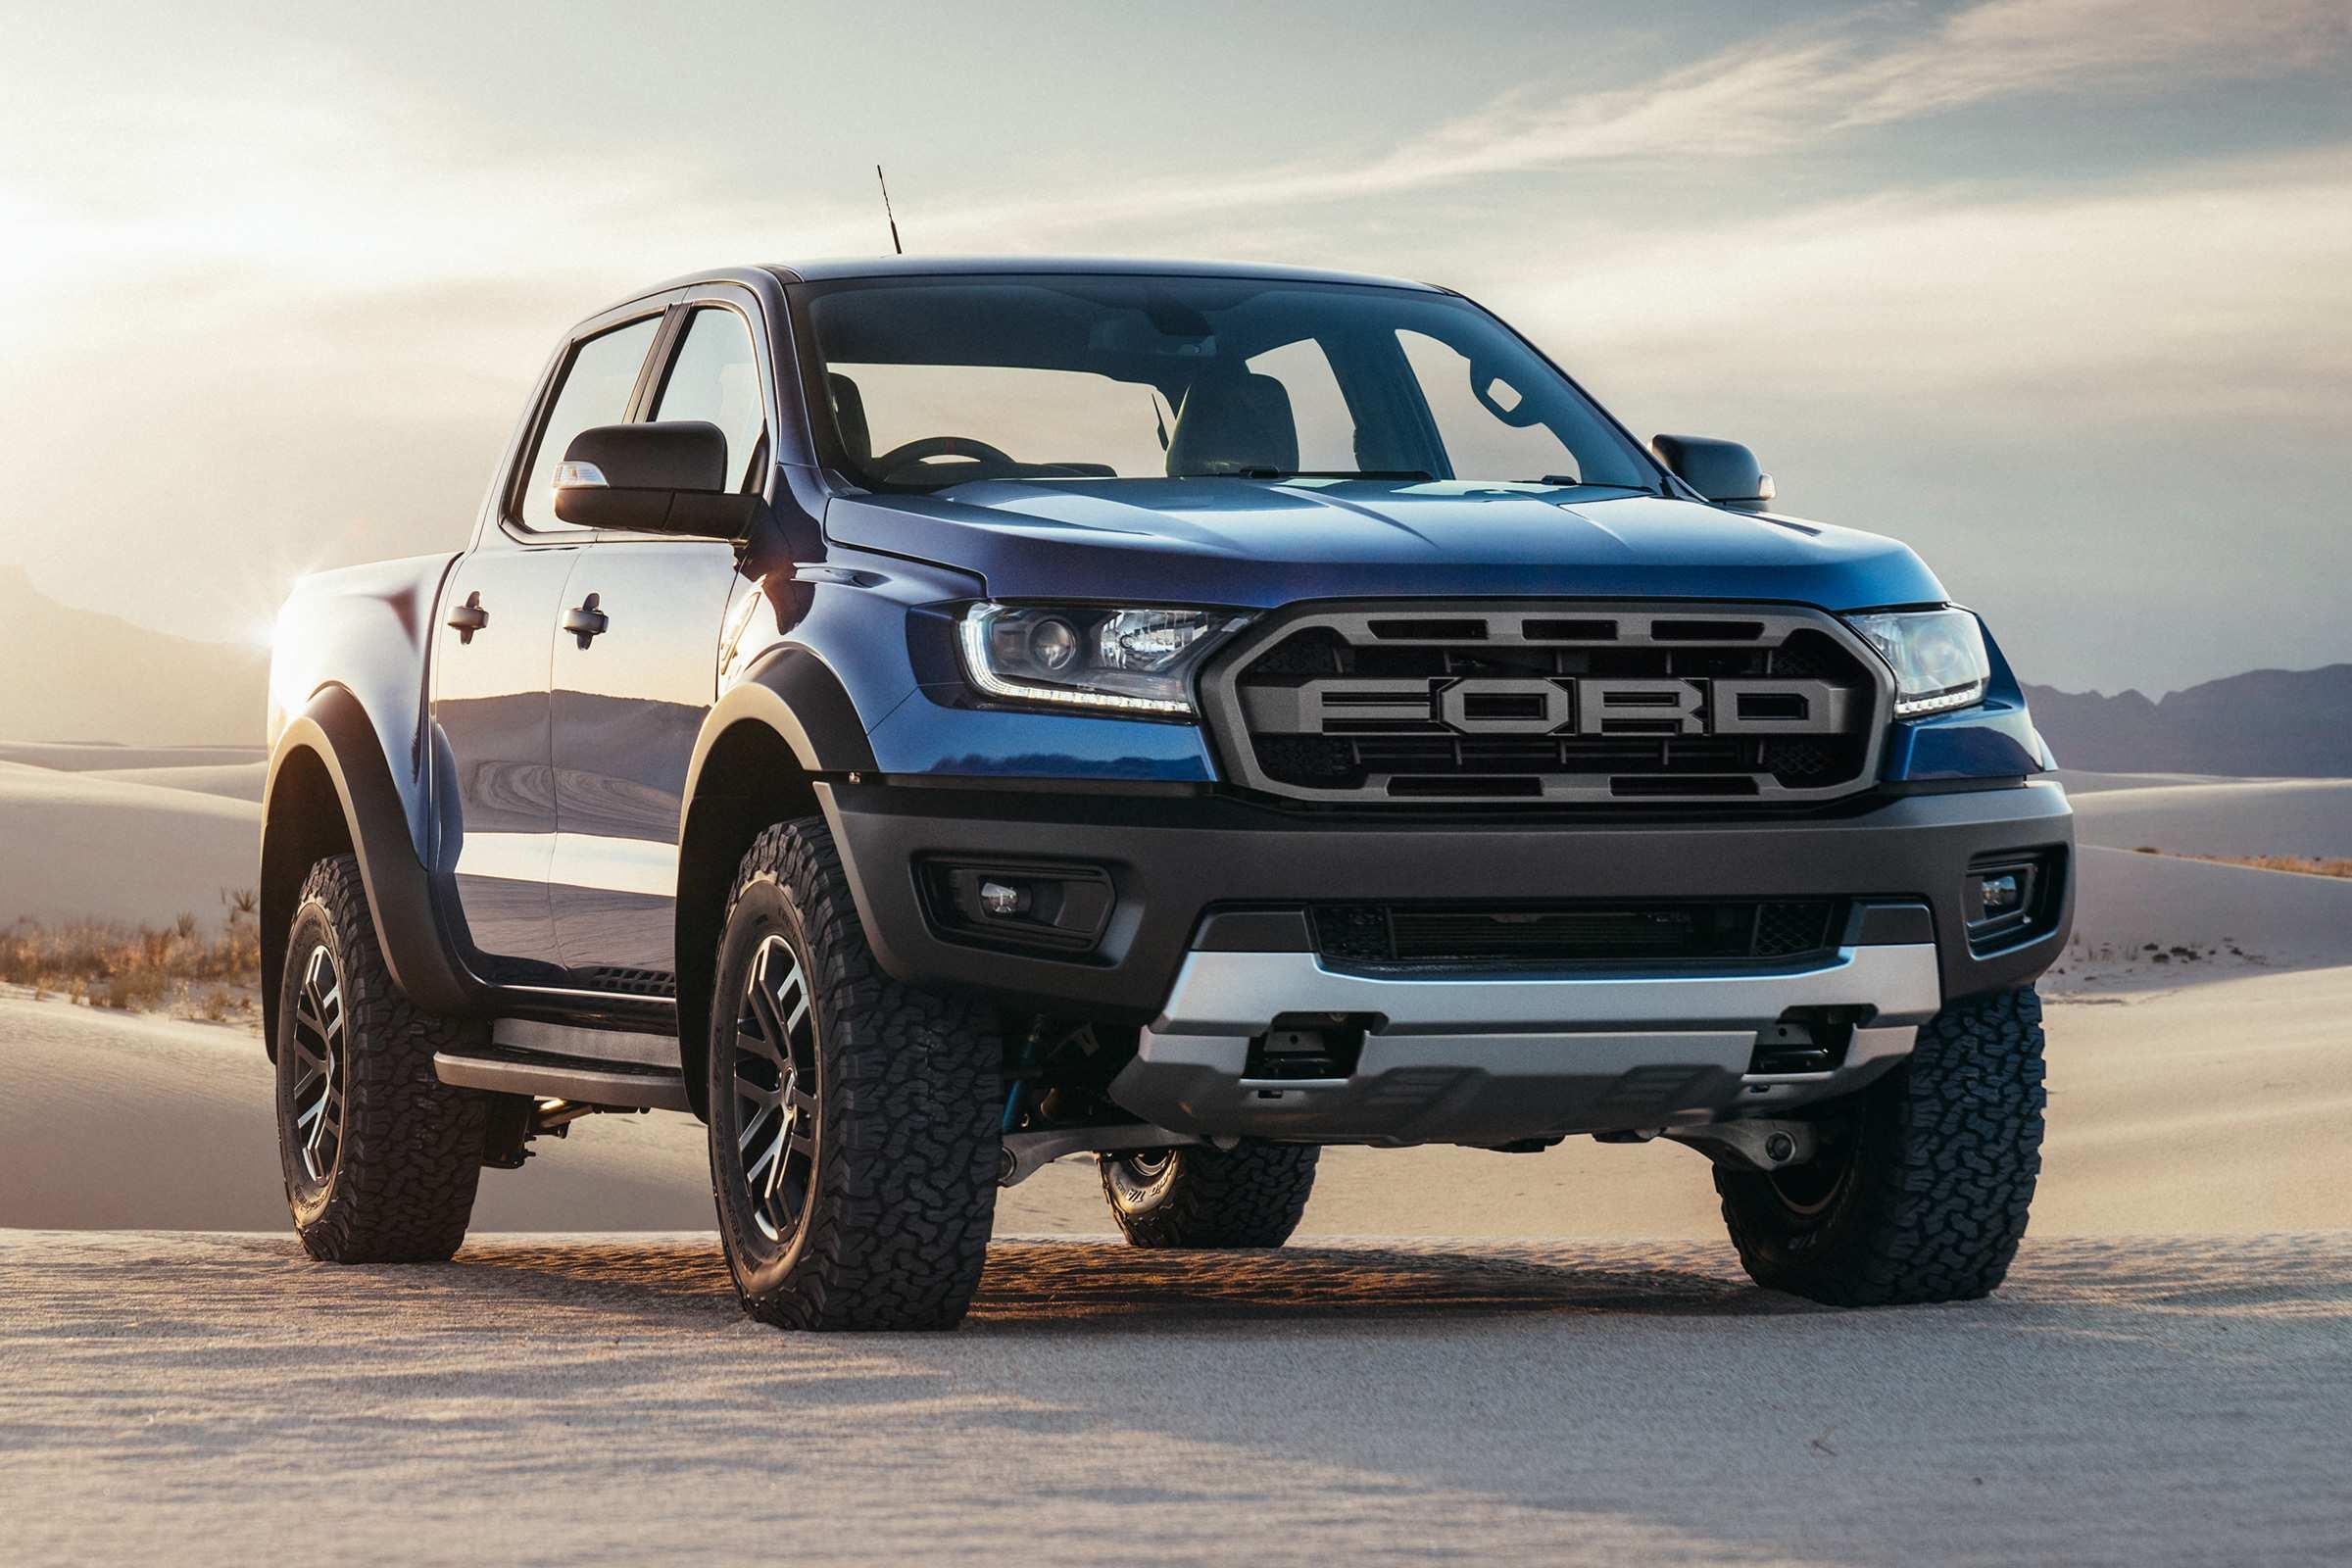 47 Gallery of 2019 Ford Velociraptor Price Release with 2019 Ford Velociraptor Price